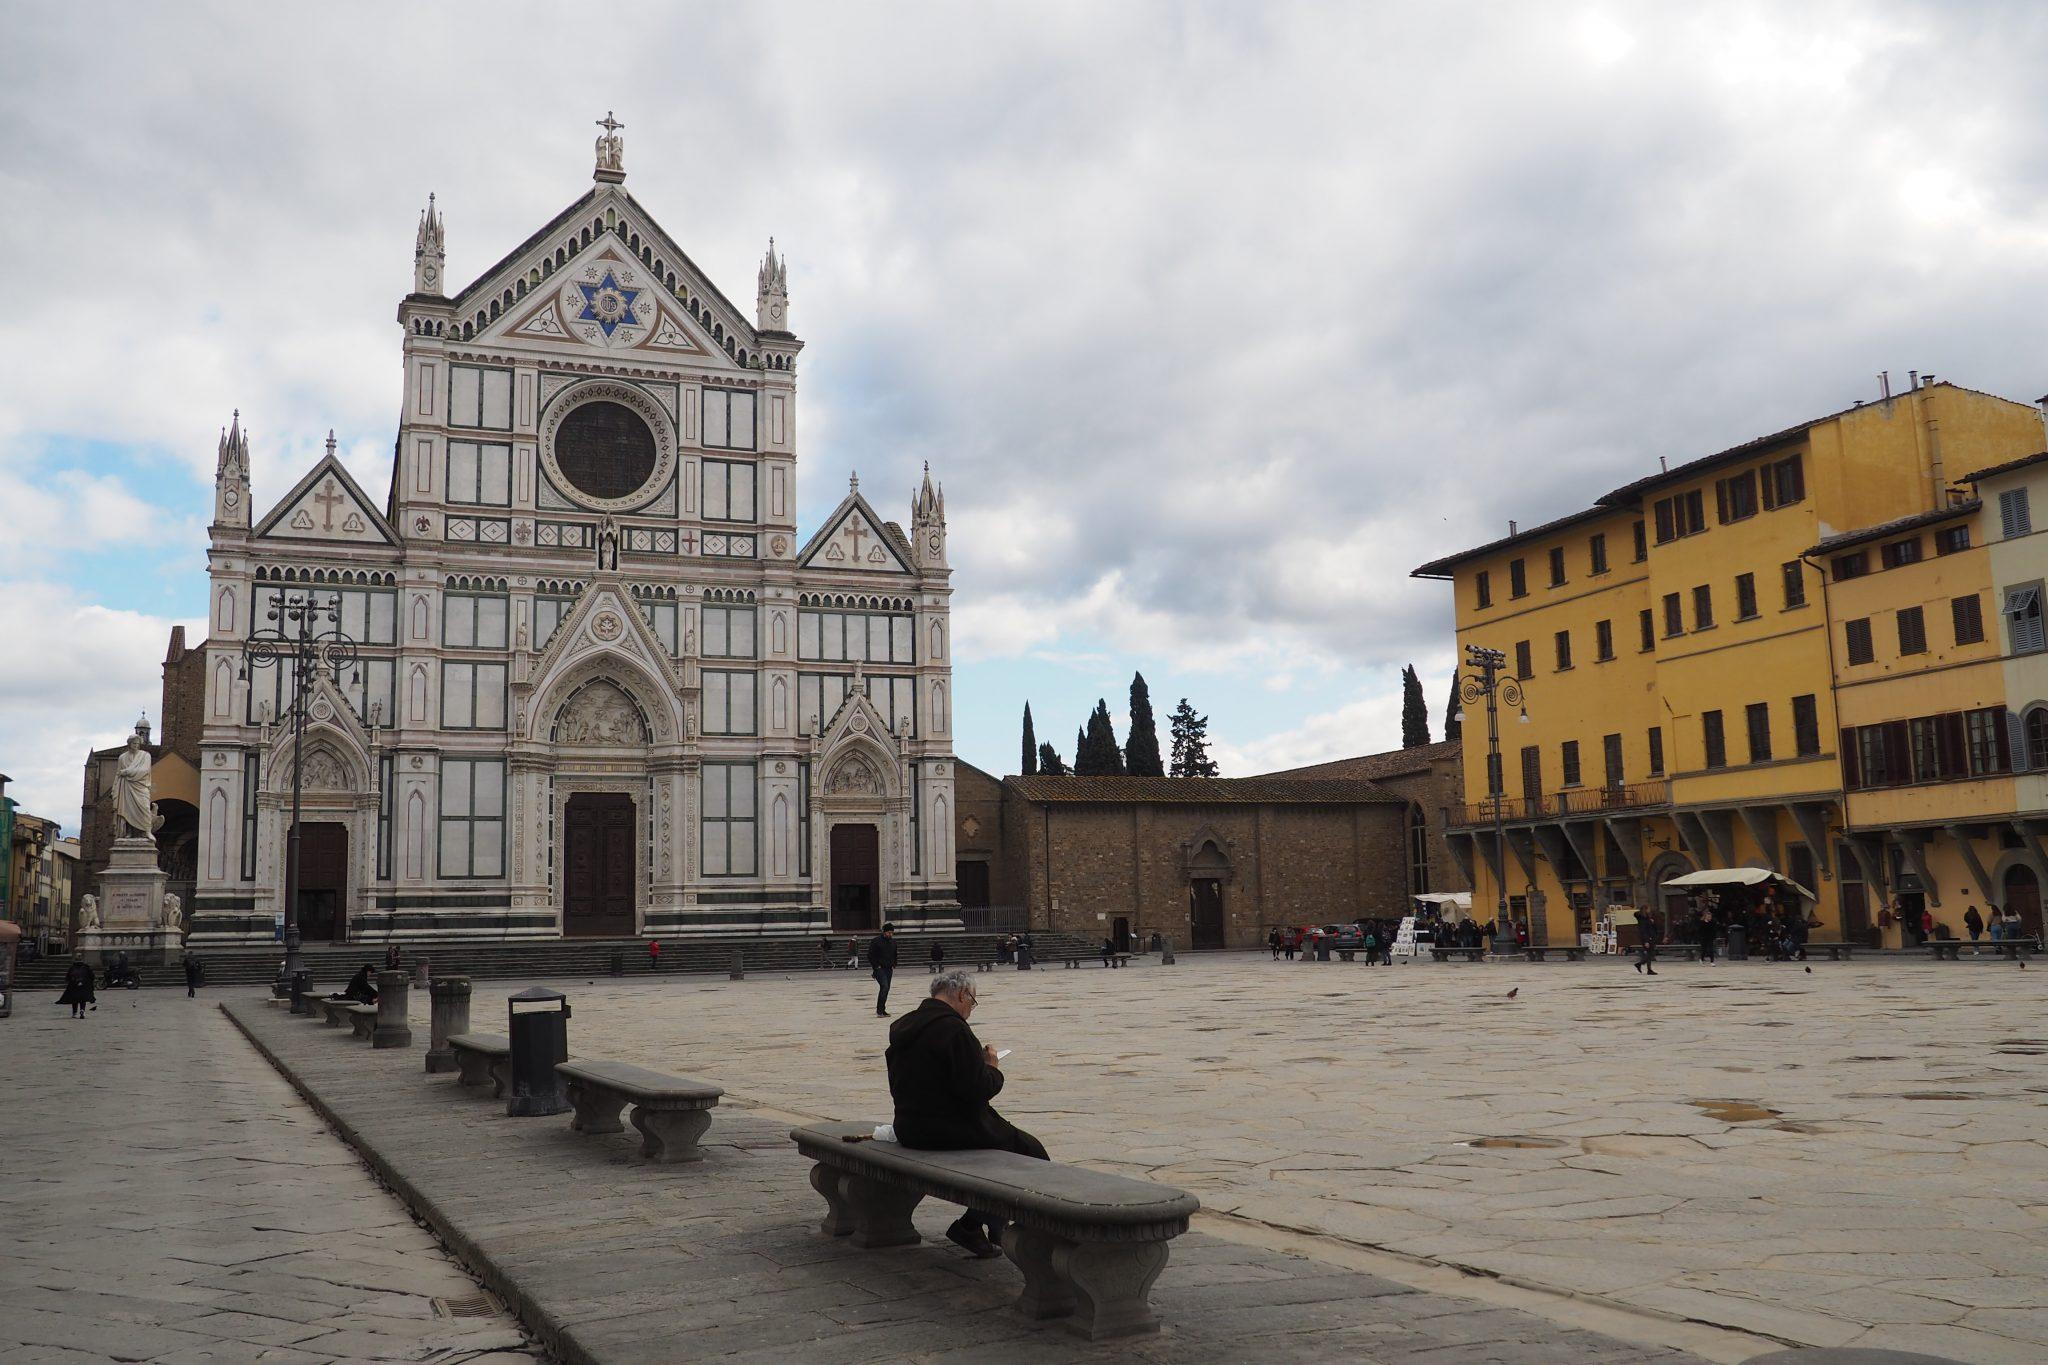 Coronavirus: Firenze libera tutti